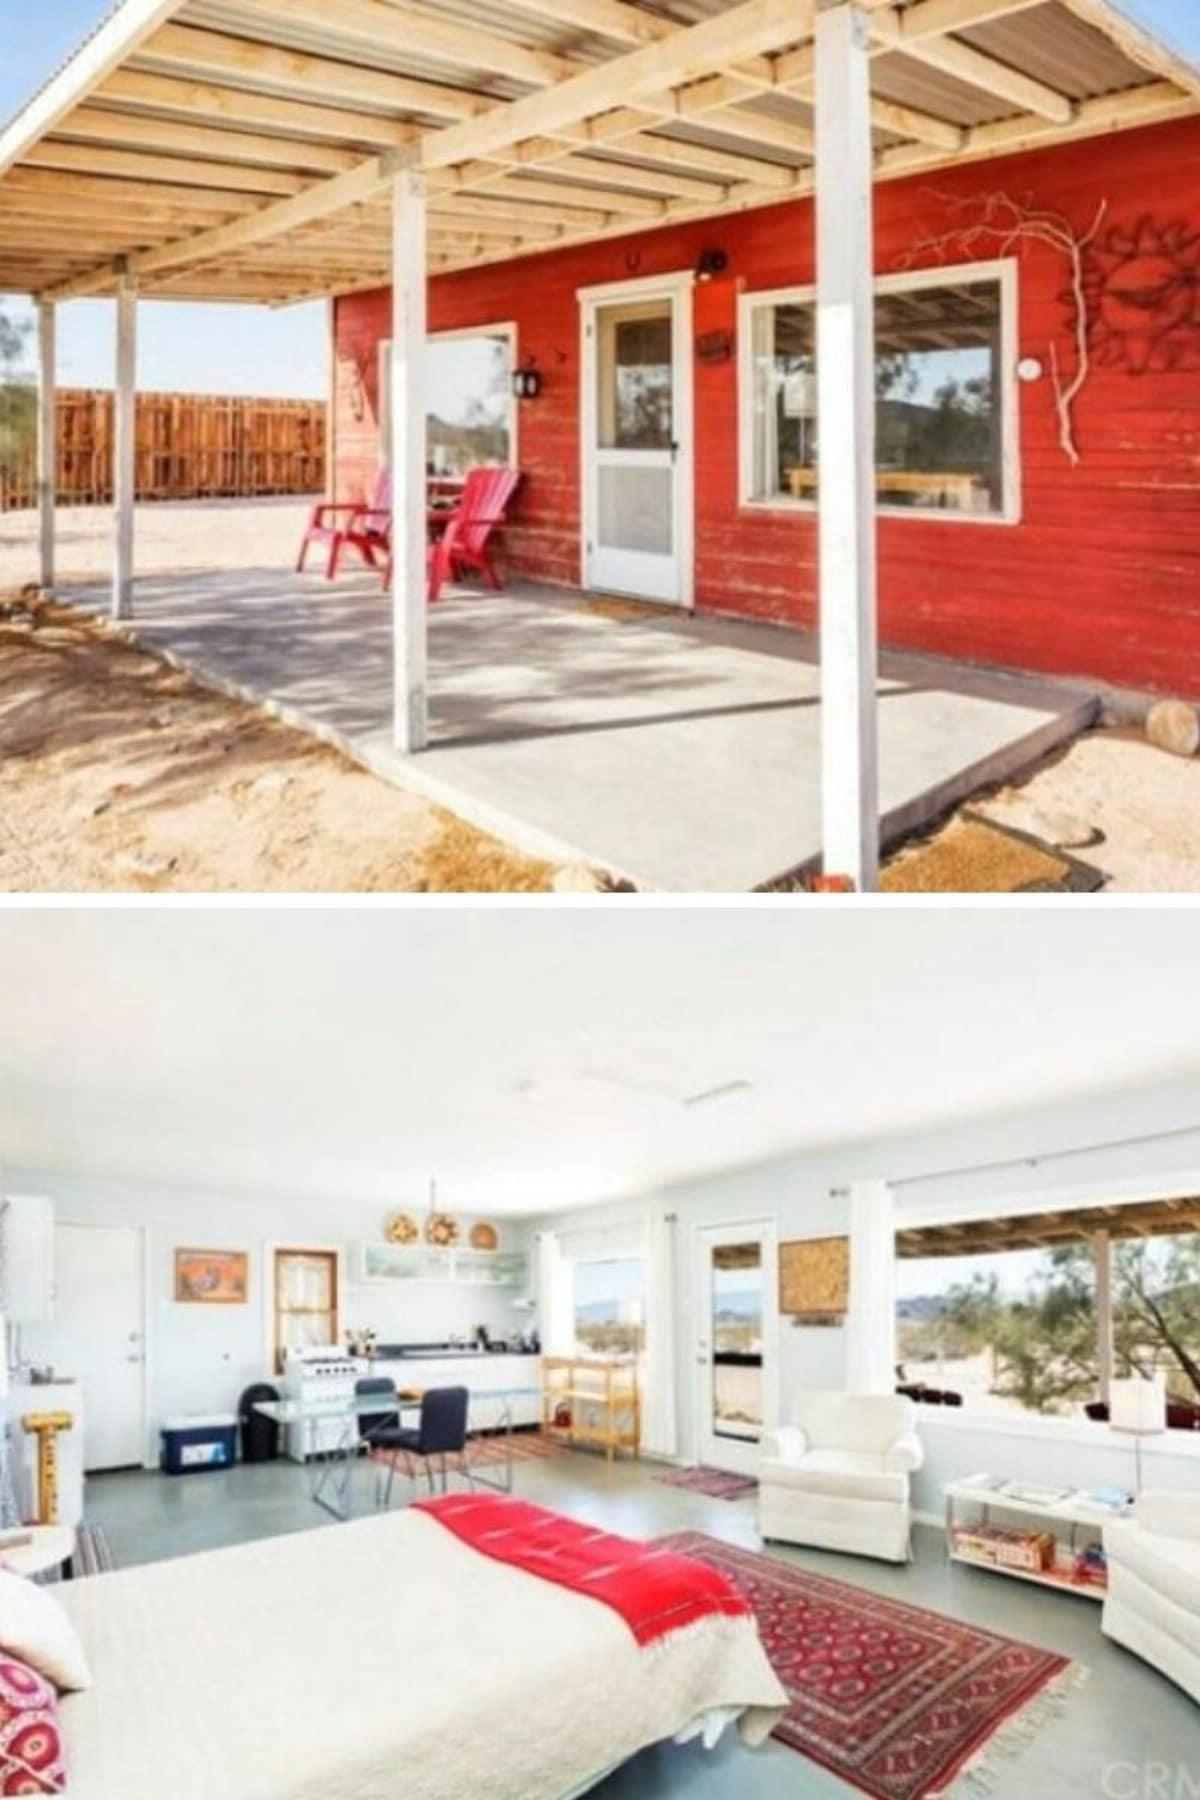 Joshua Tree, CA Tiny House With Open Floor Plan